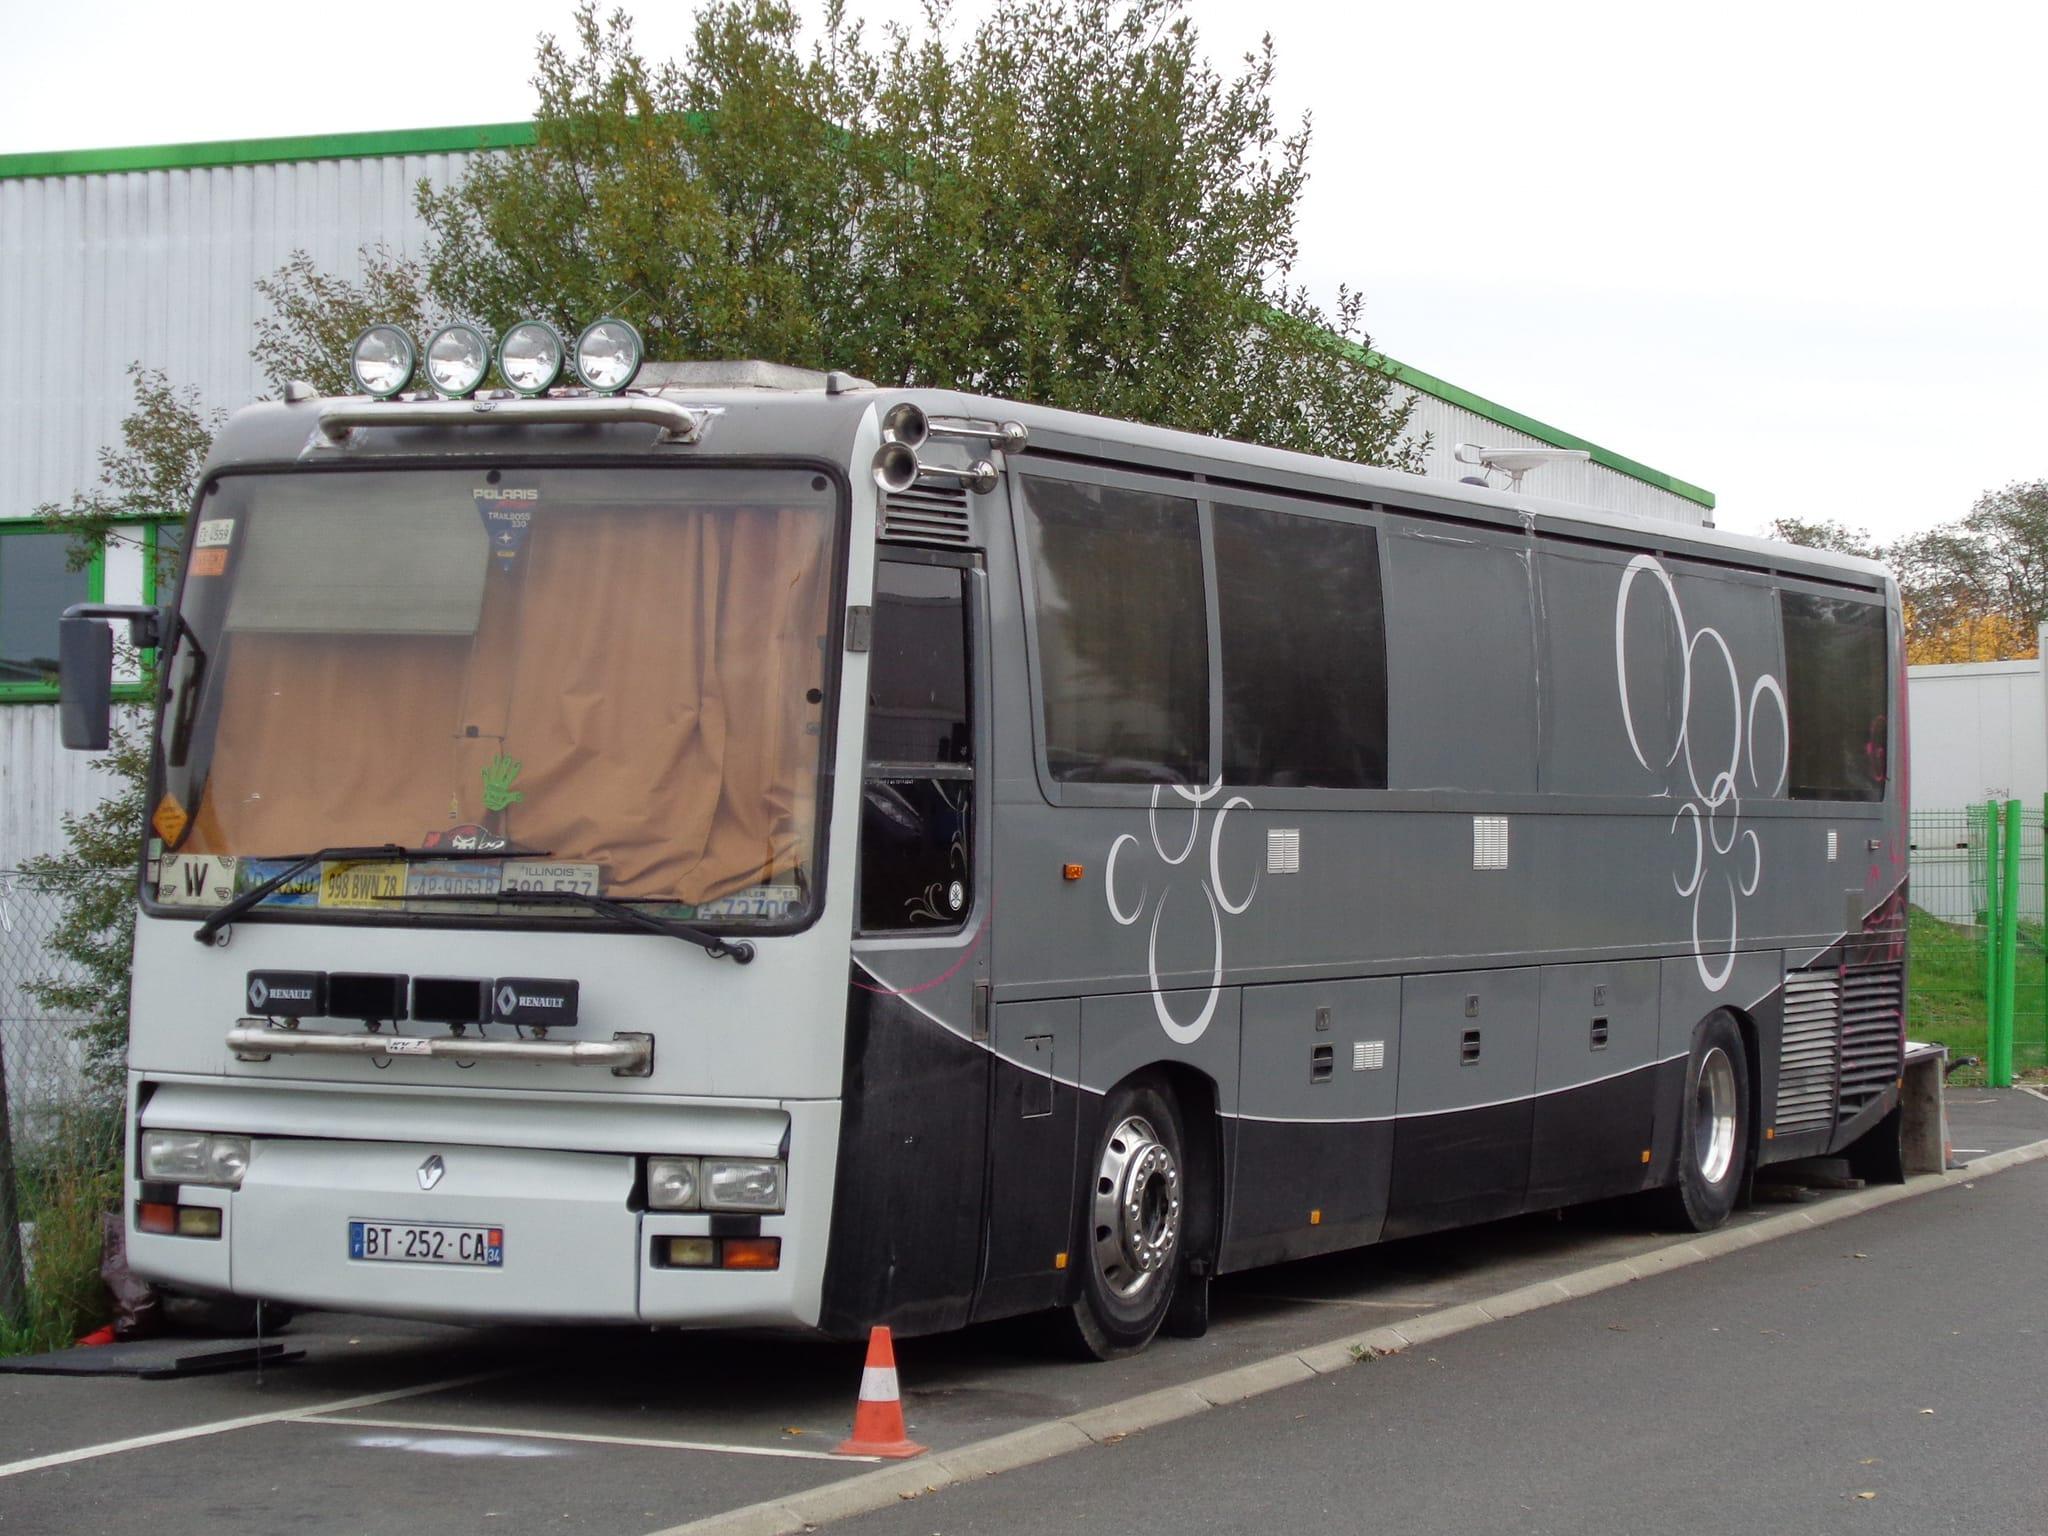 Woonmobile-(45)